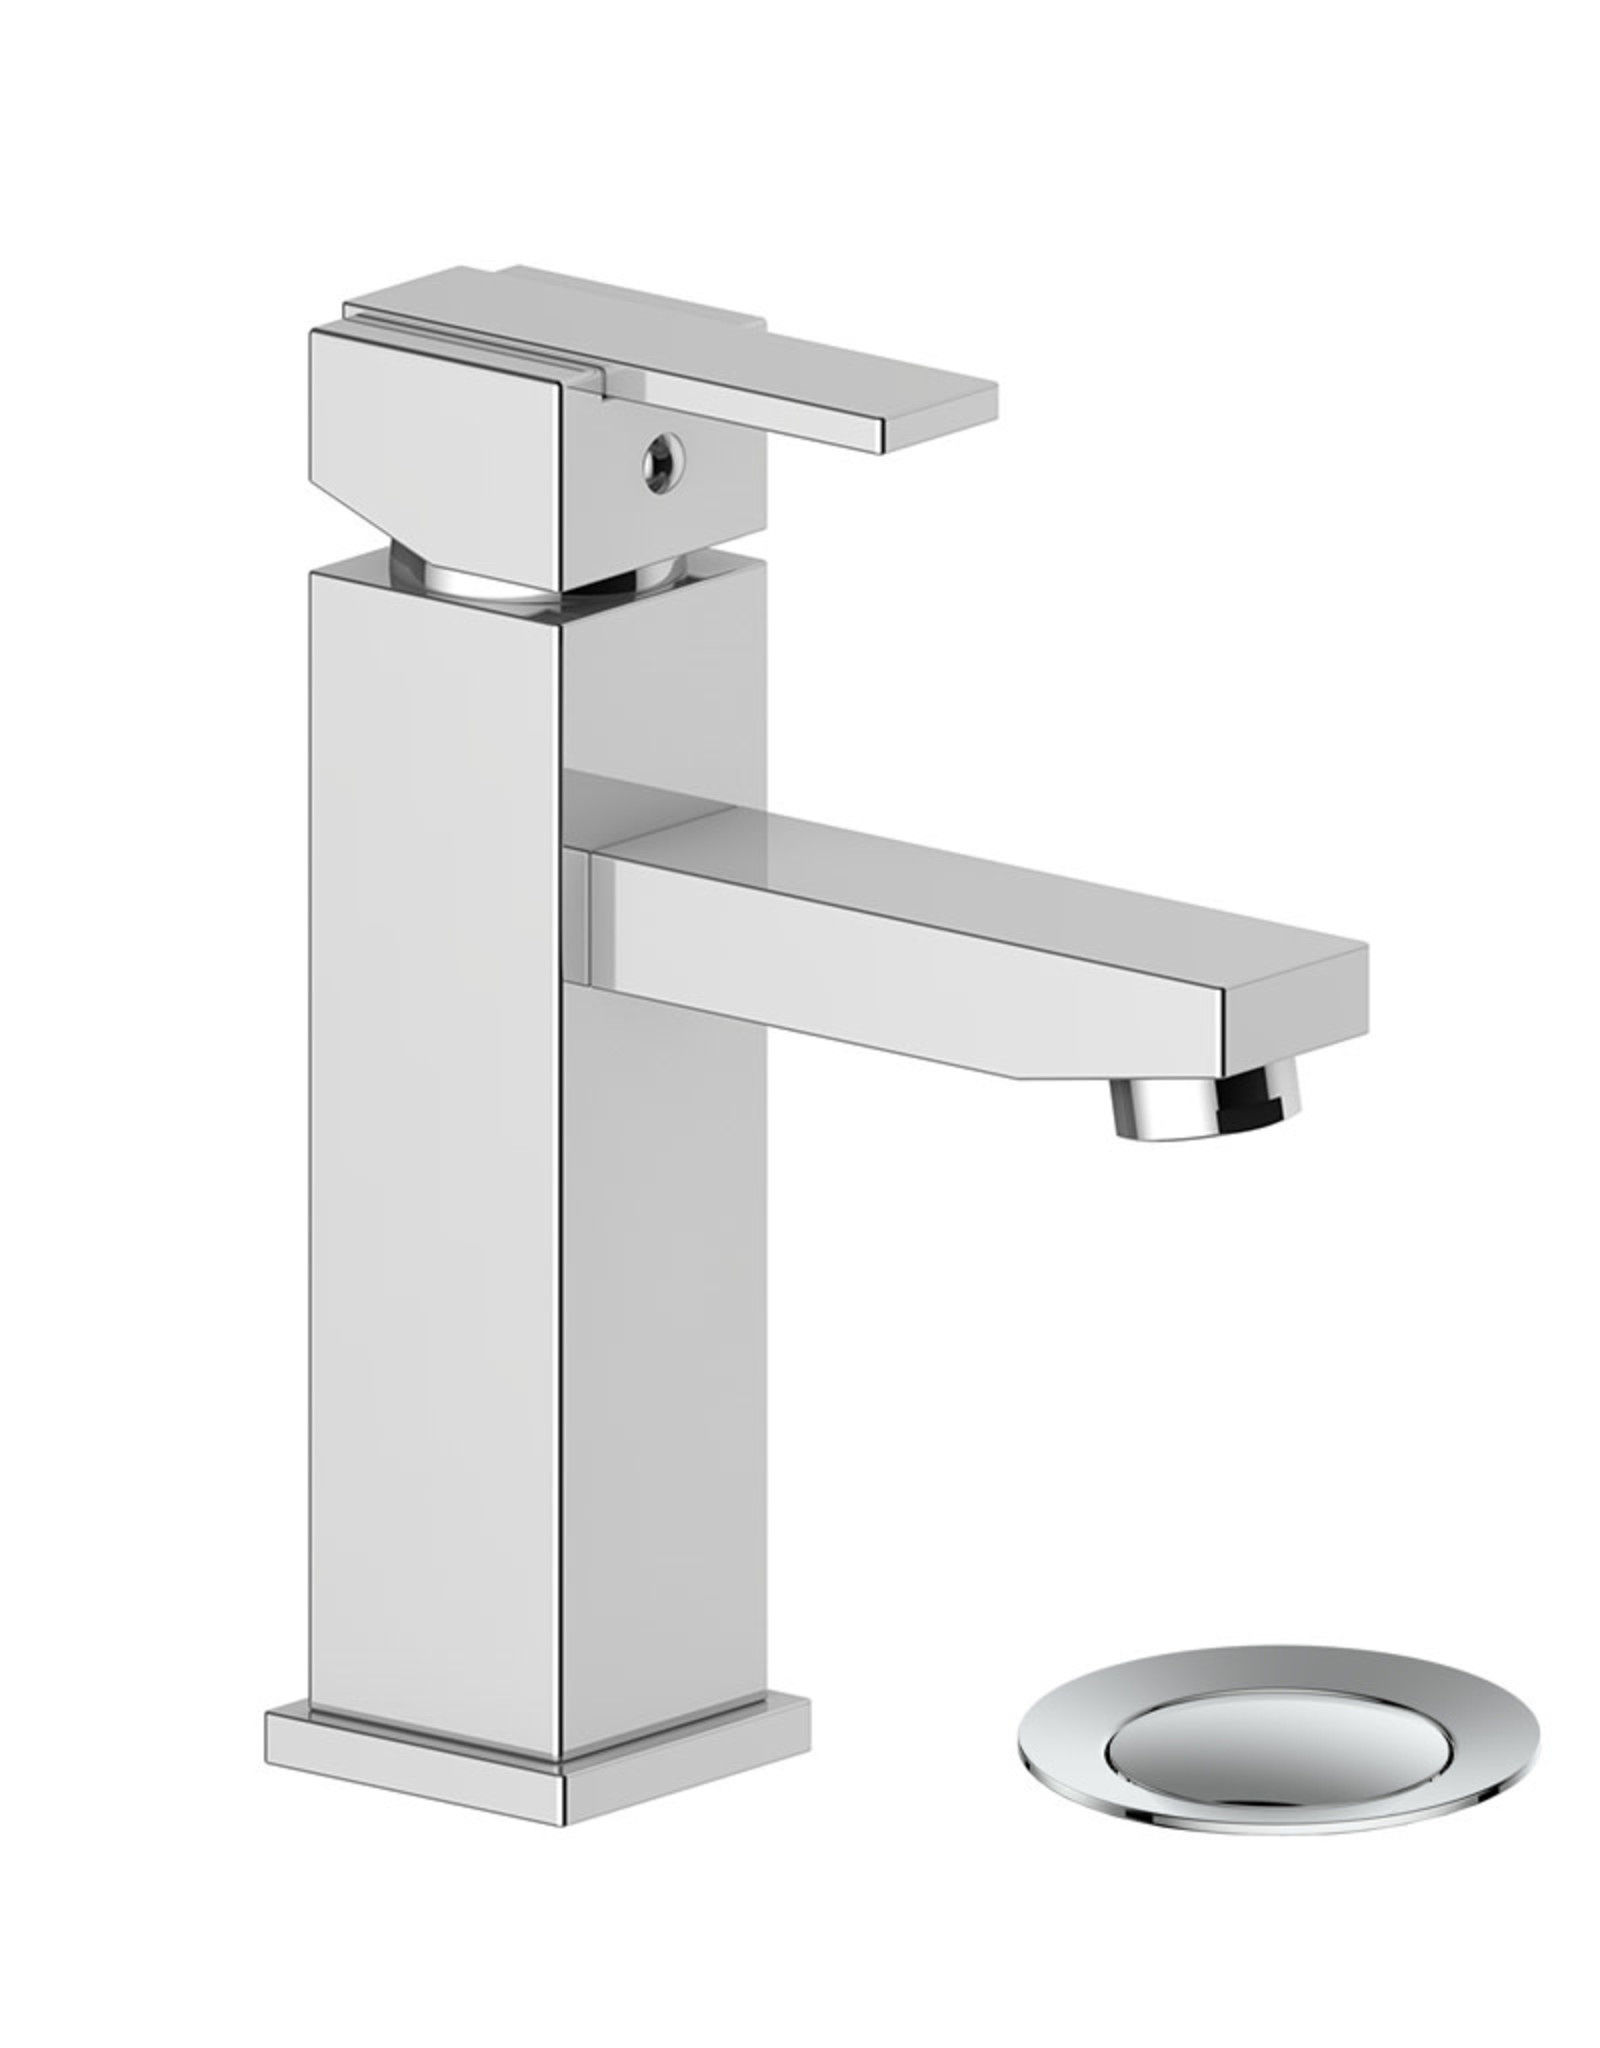 Vogt Kapfenberg- Single Hole Lav Faucet- Chrome